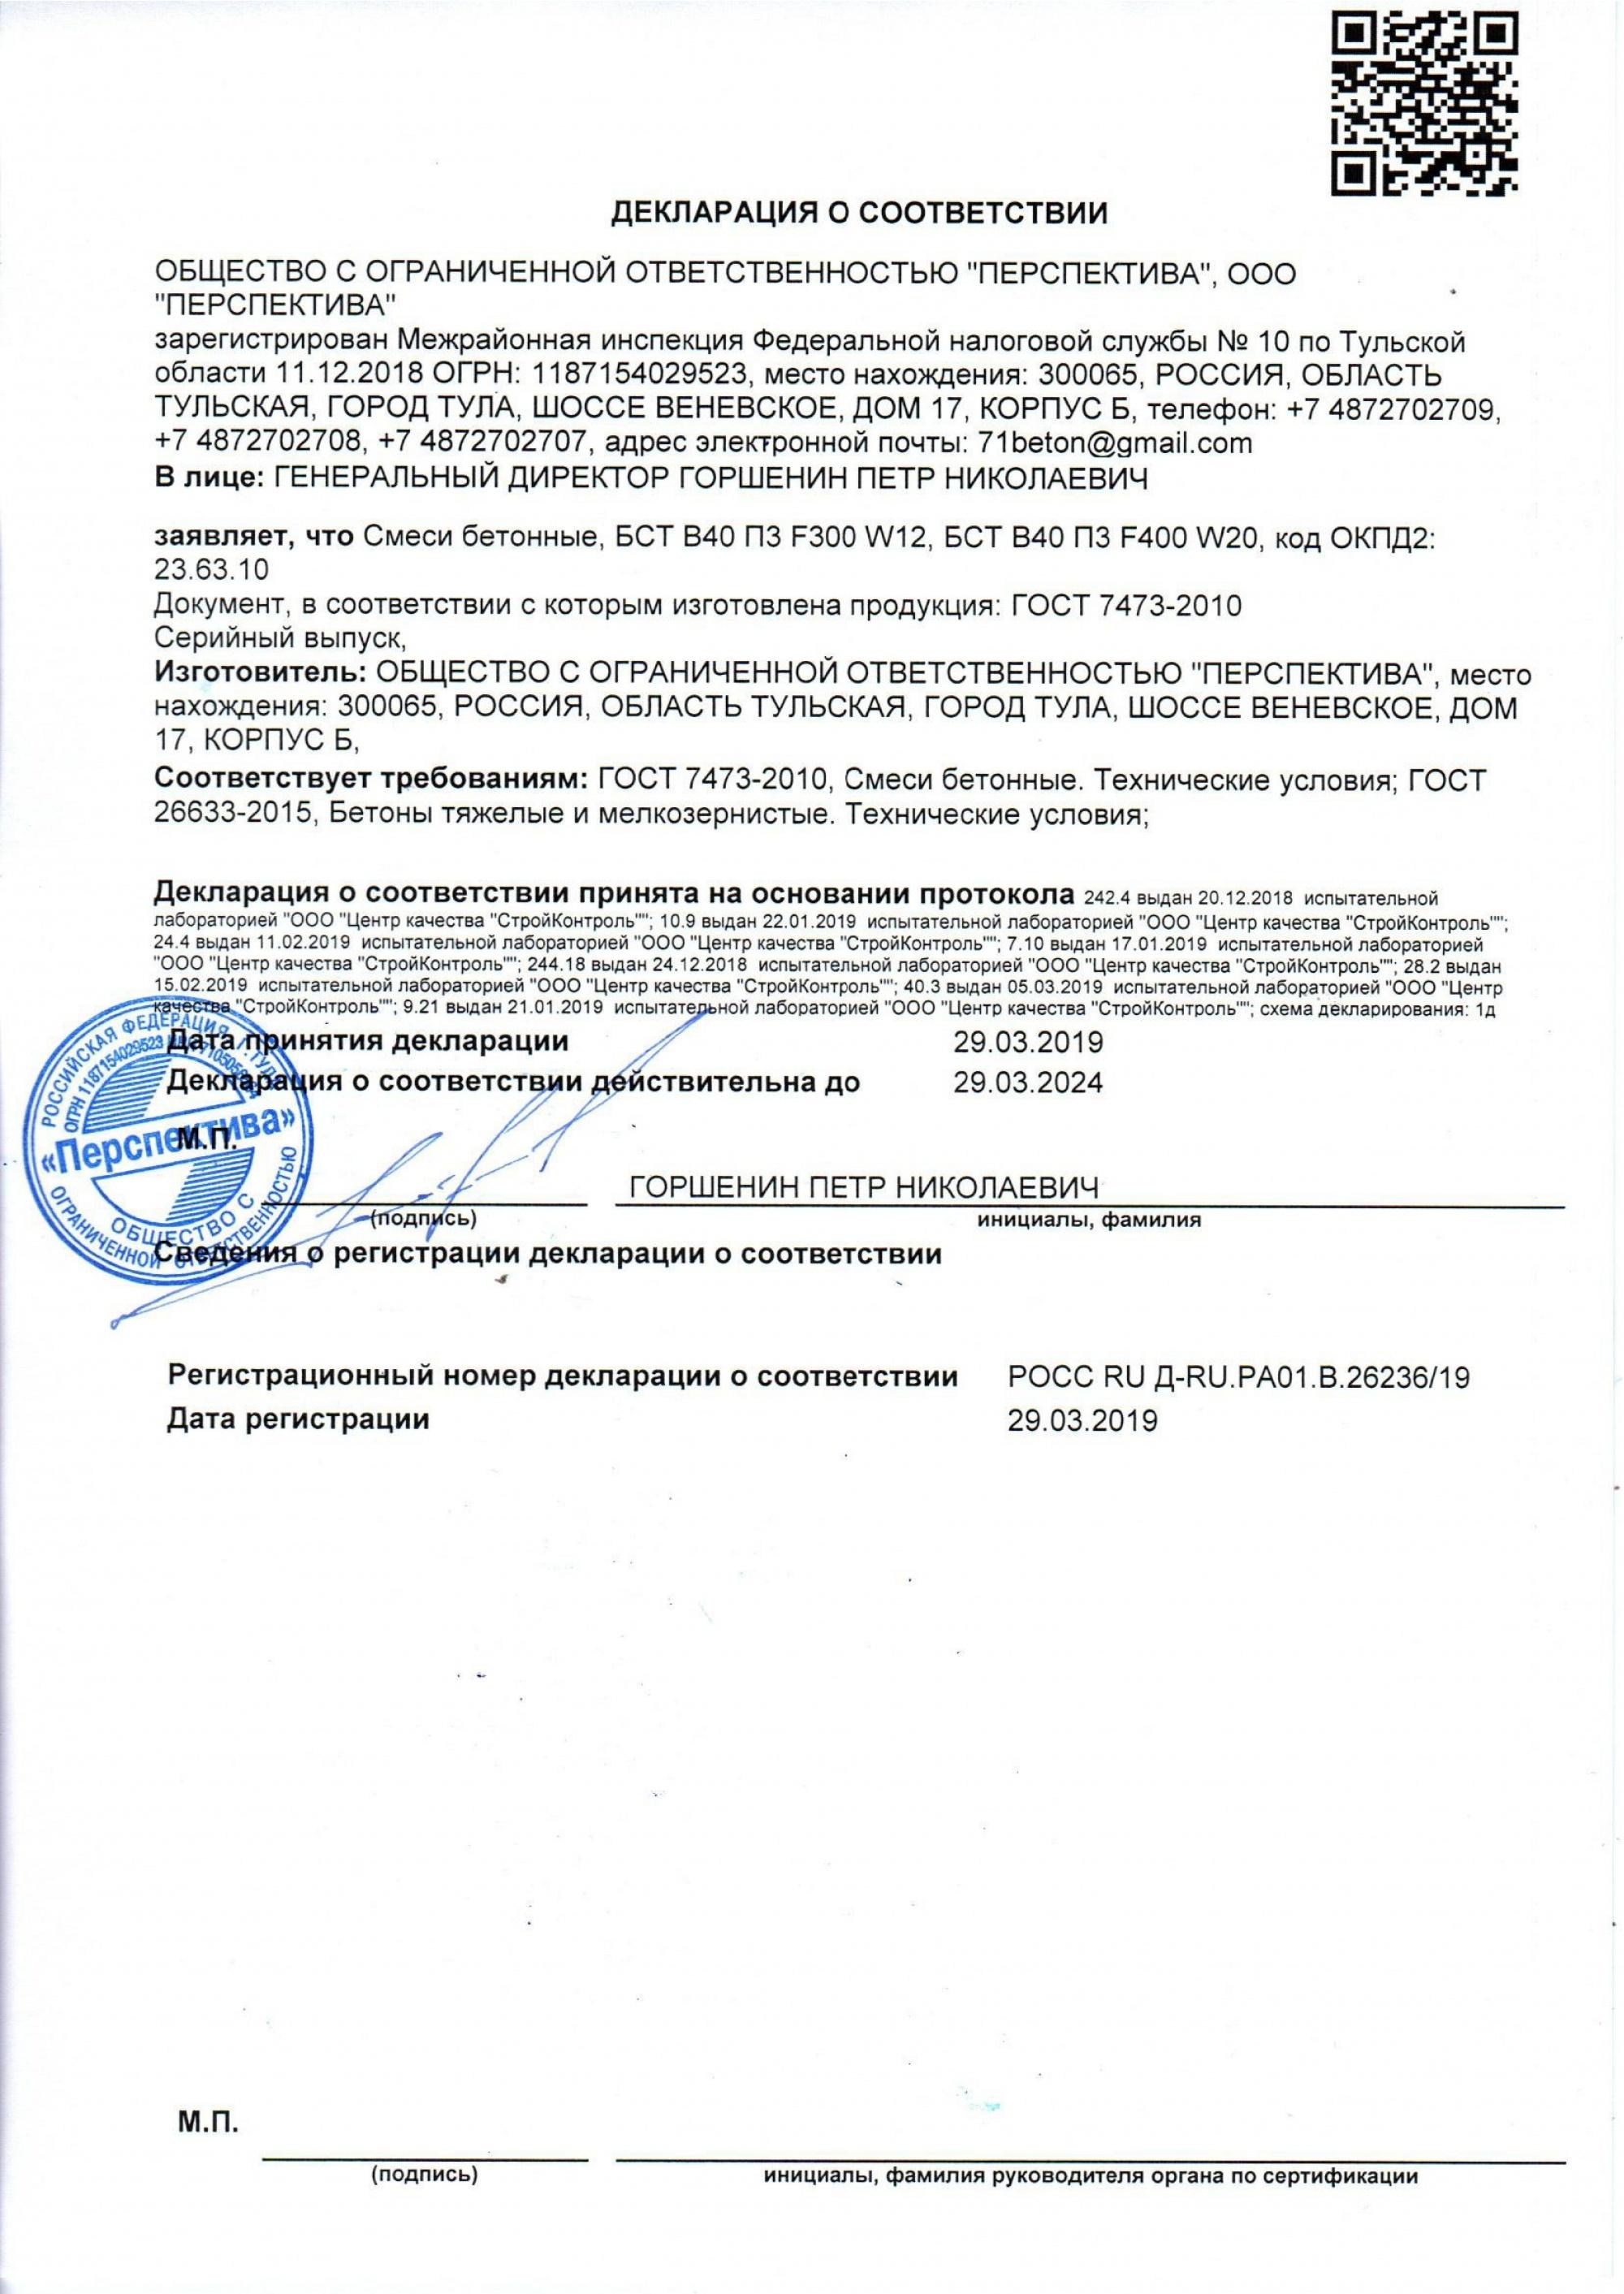 Перспектива тула бетон бетон октябрьский башкортостан